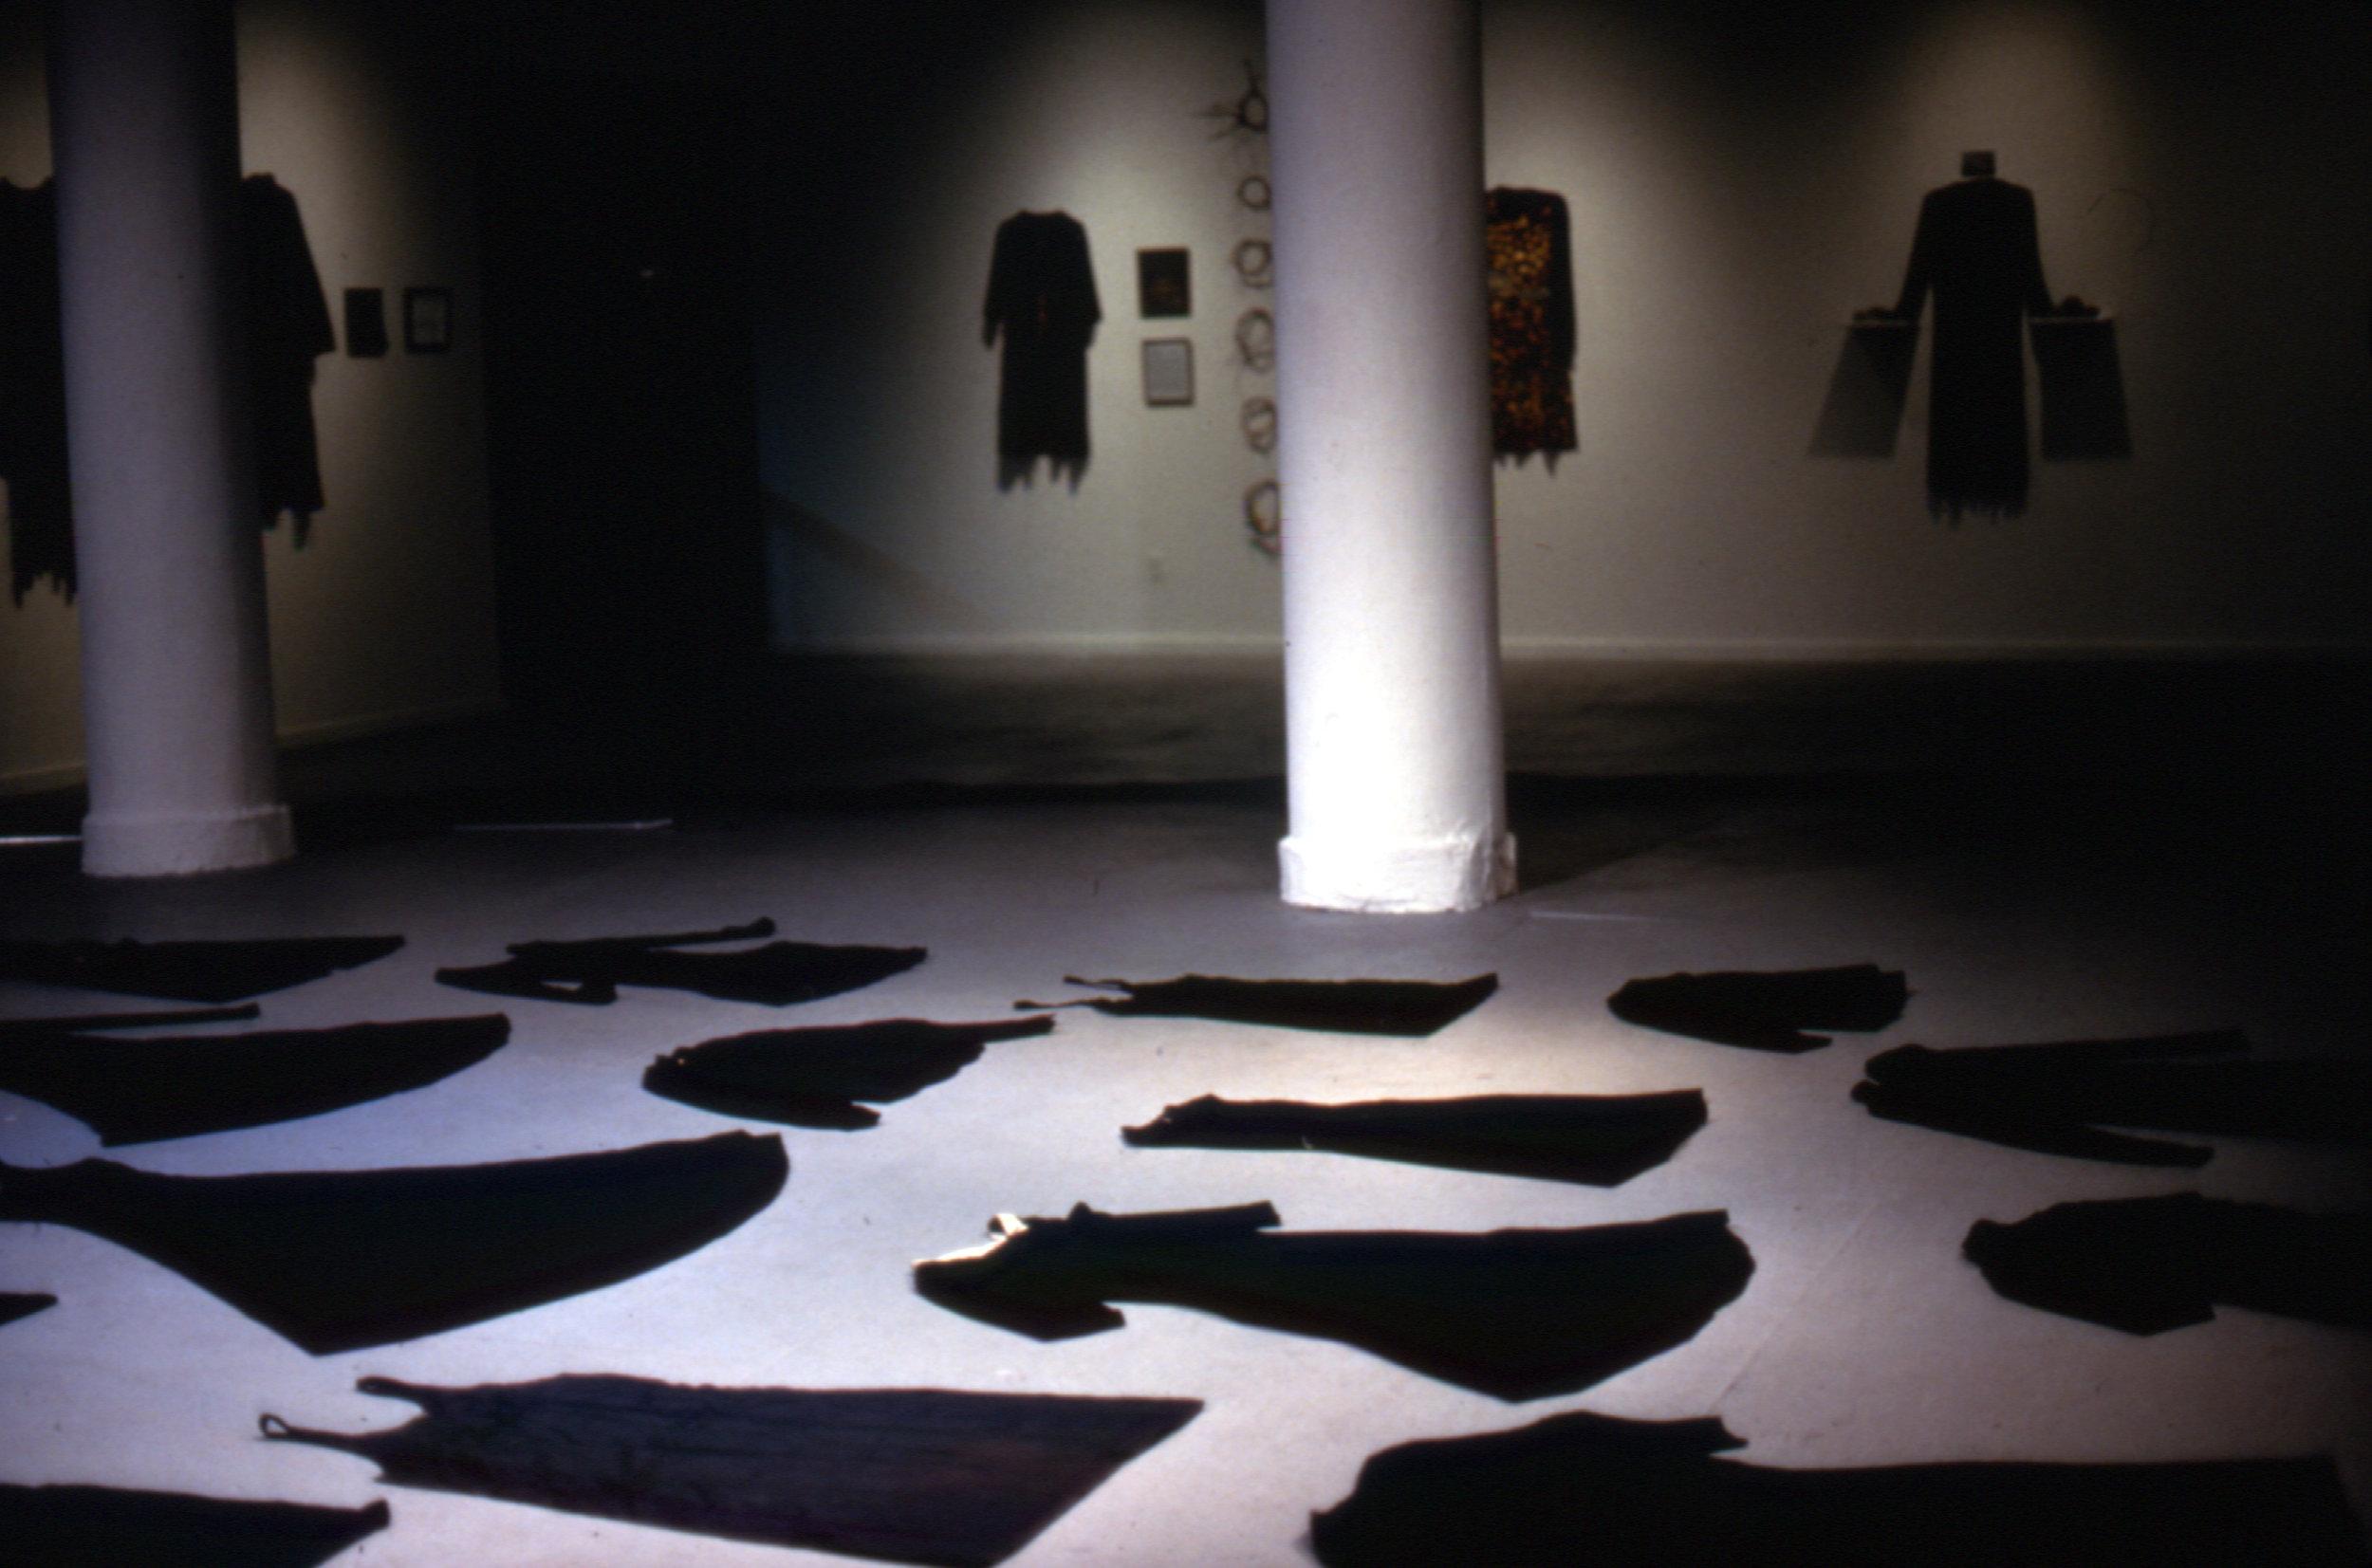 TUAT_artistspace_install_dresses.jpg